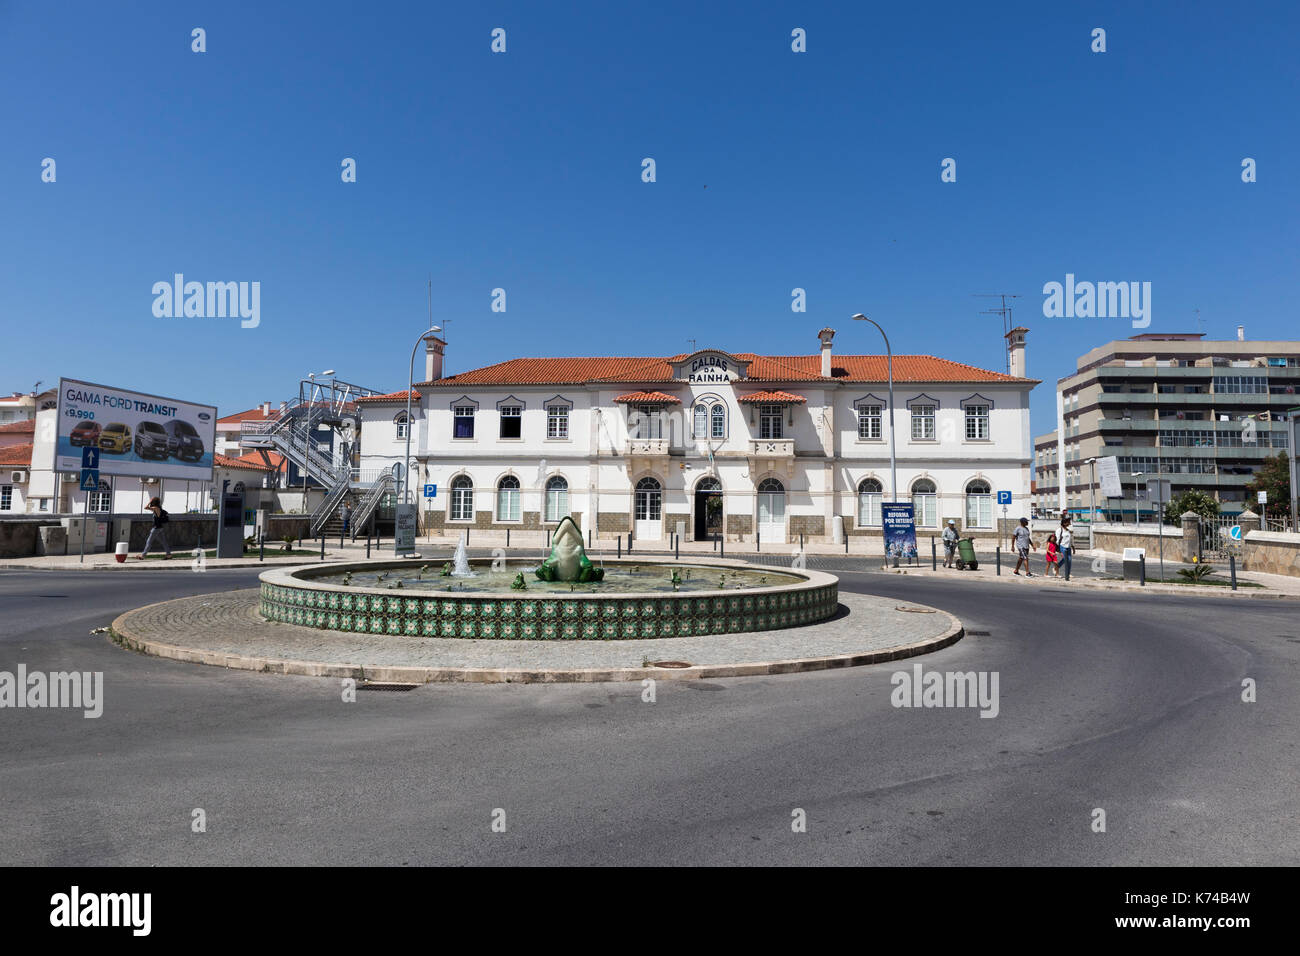 Fountain on the roundabout in front of Caldas da Rainha railway station Portugal on Avenida 1º de Maio - Stock Image